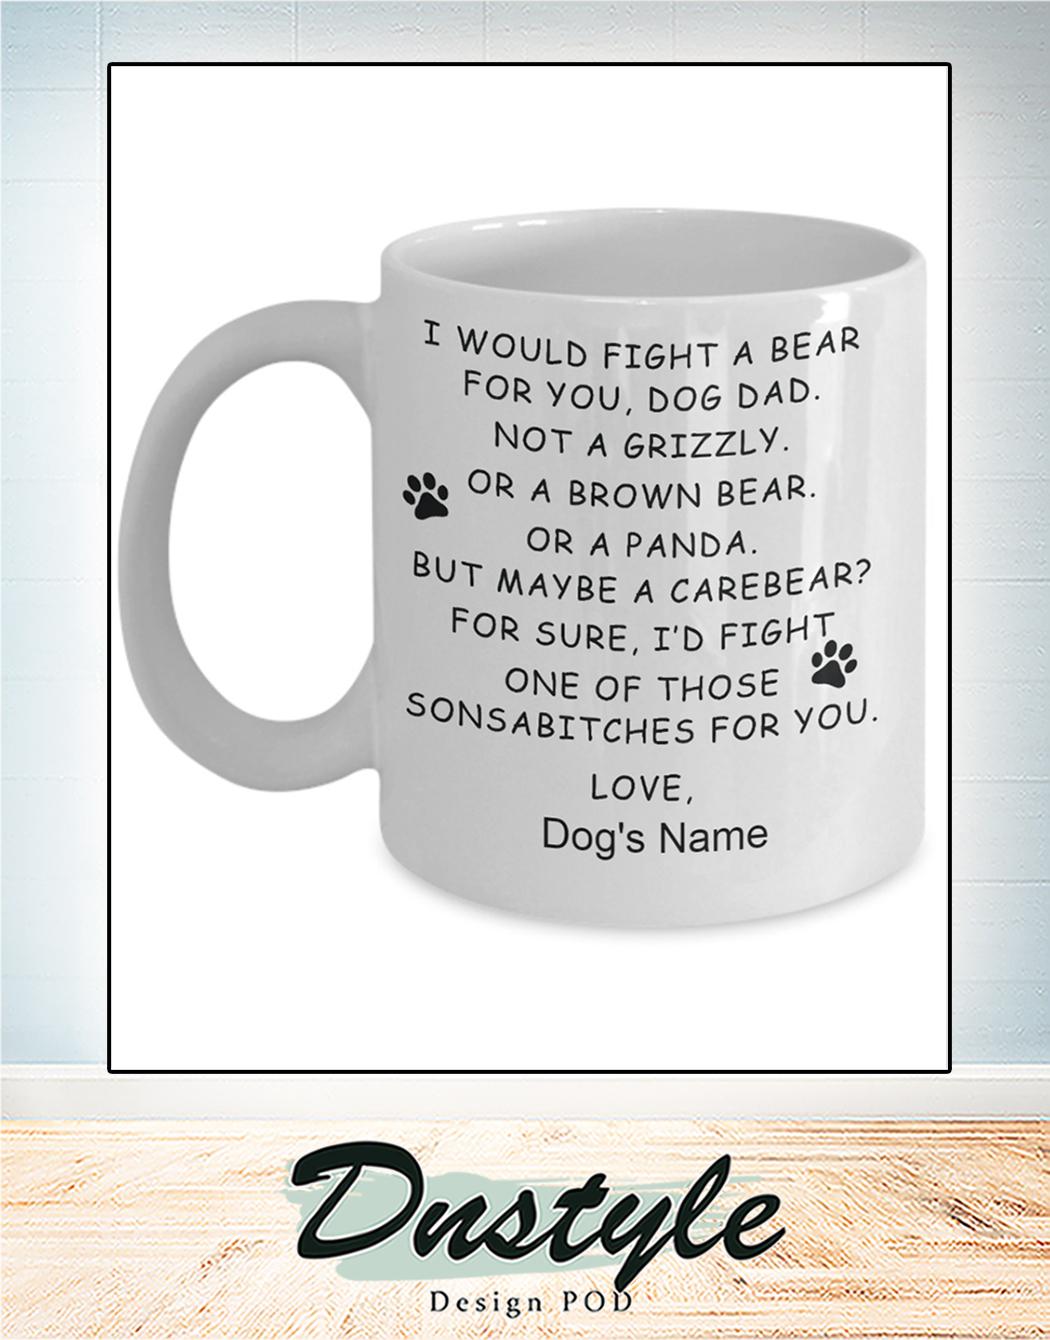 I would fight a bear for you dog dad mug 1